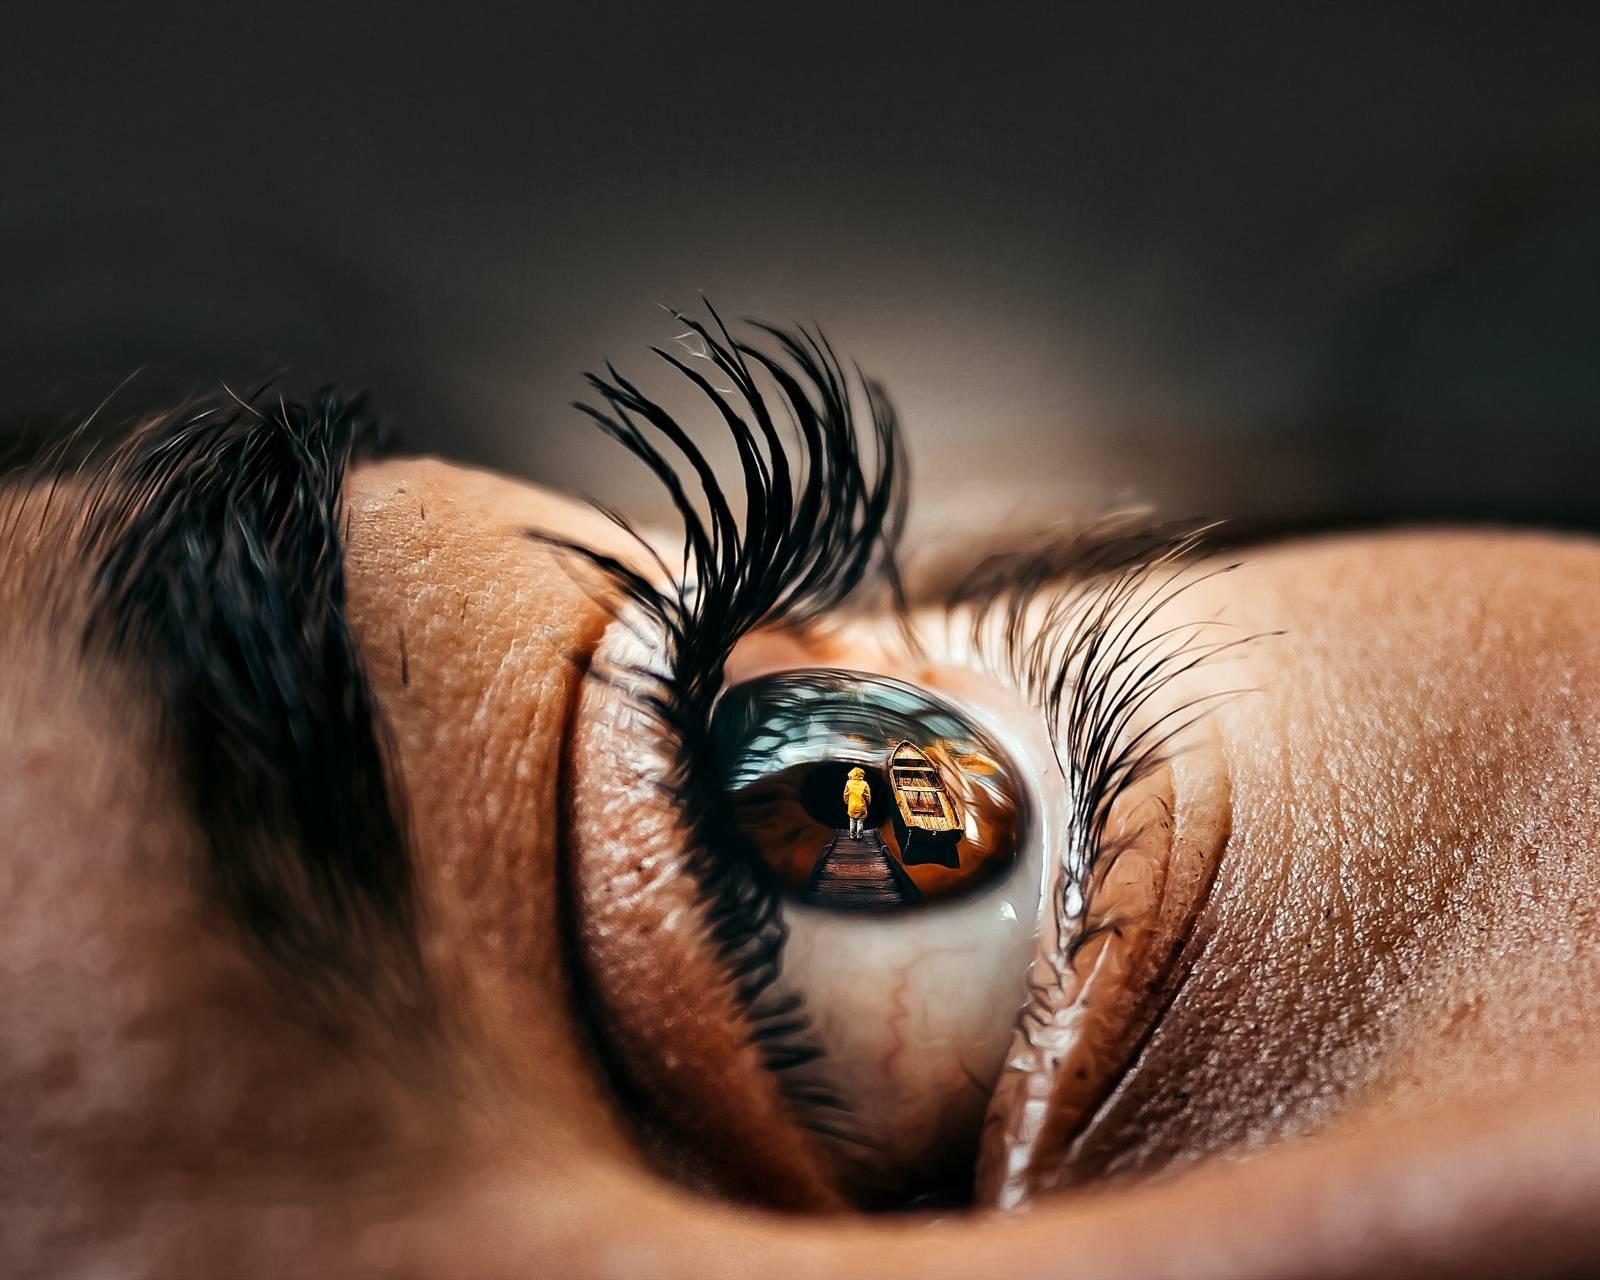 Feeling eye